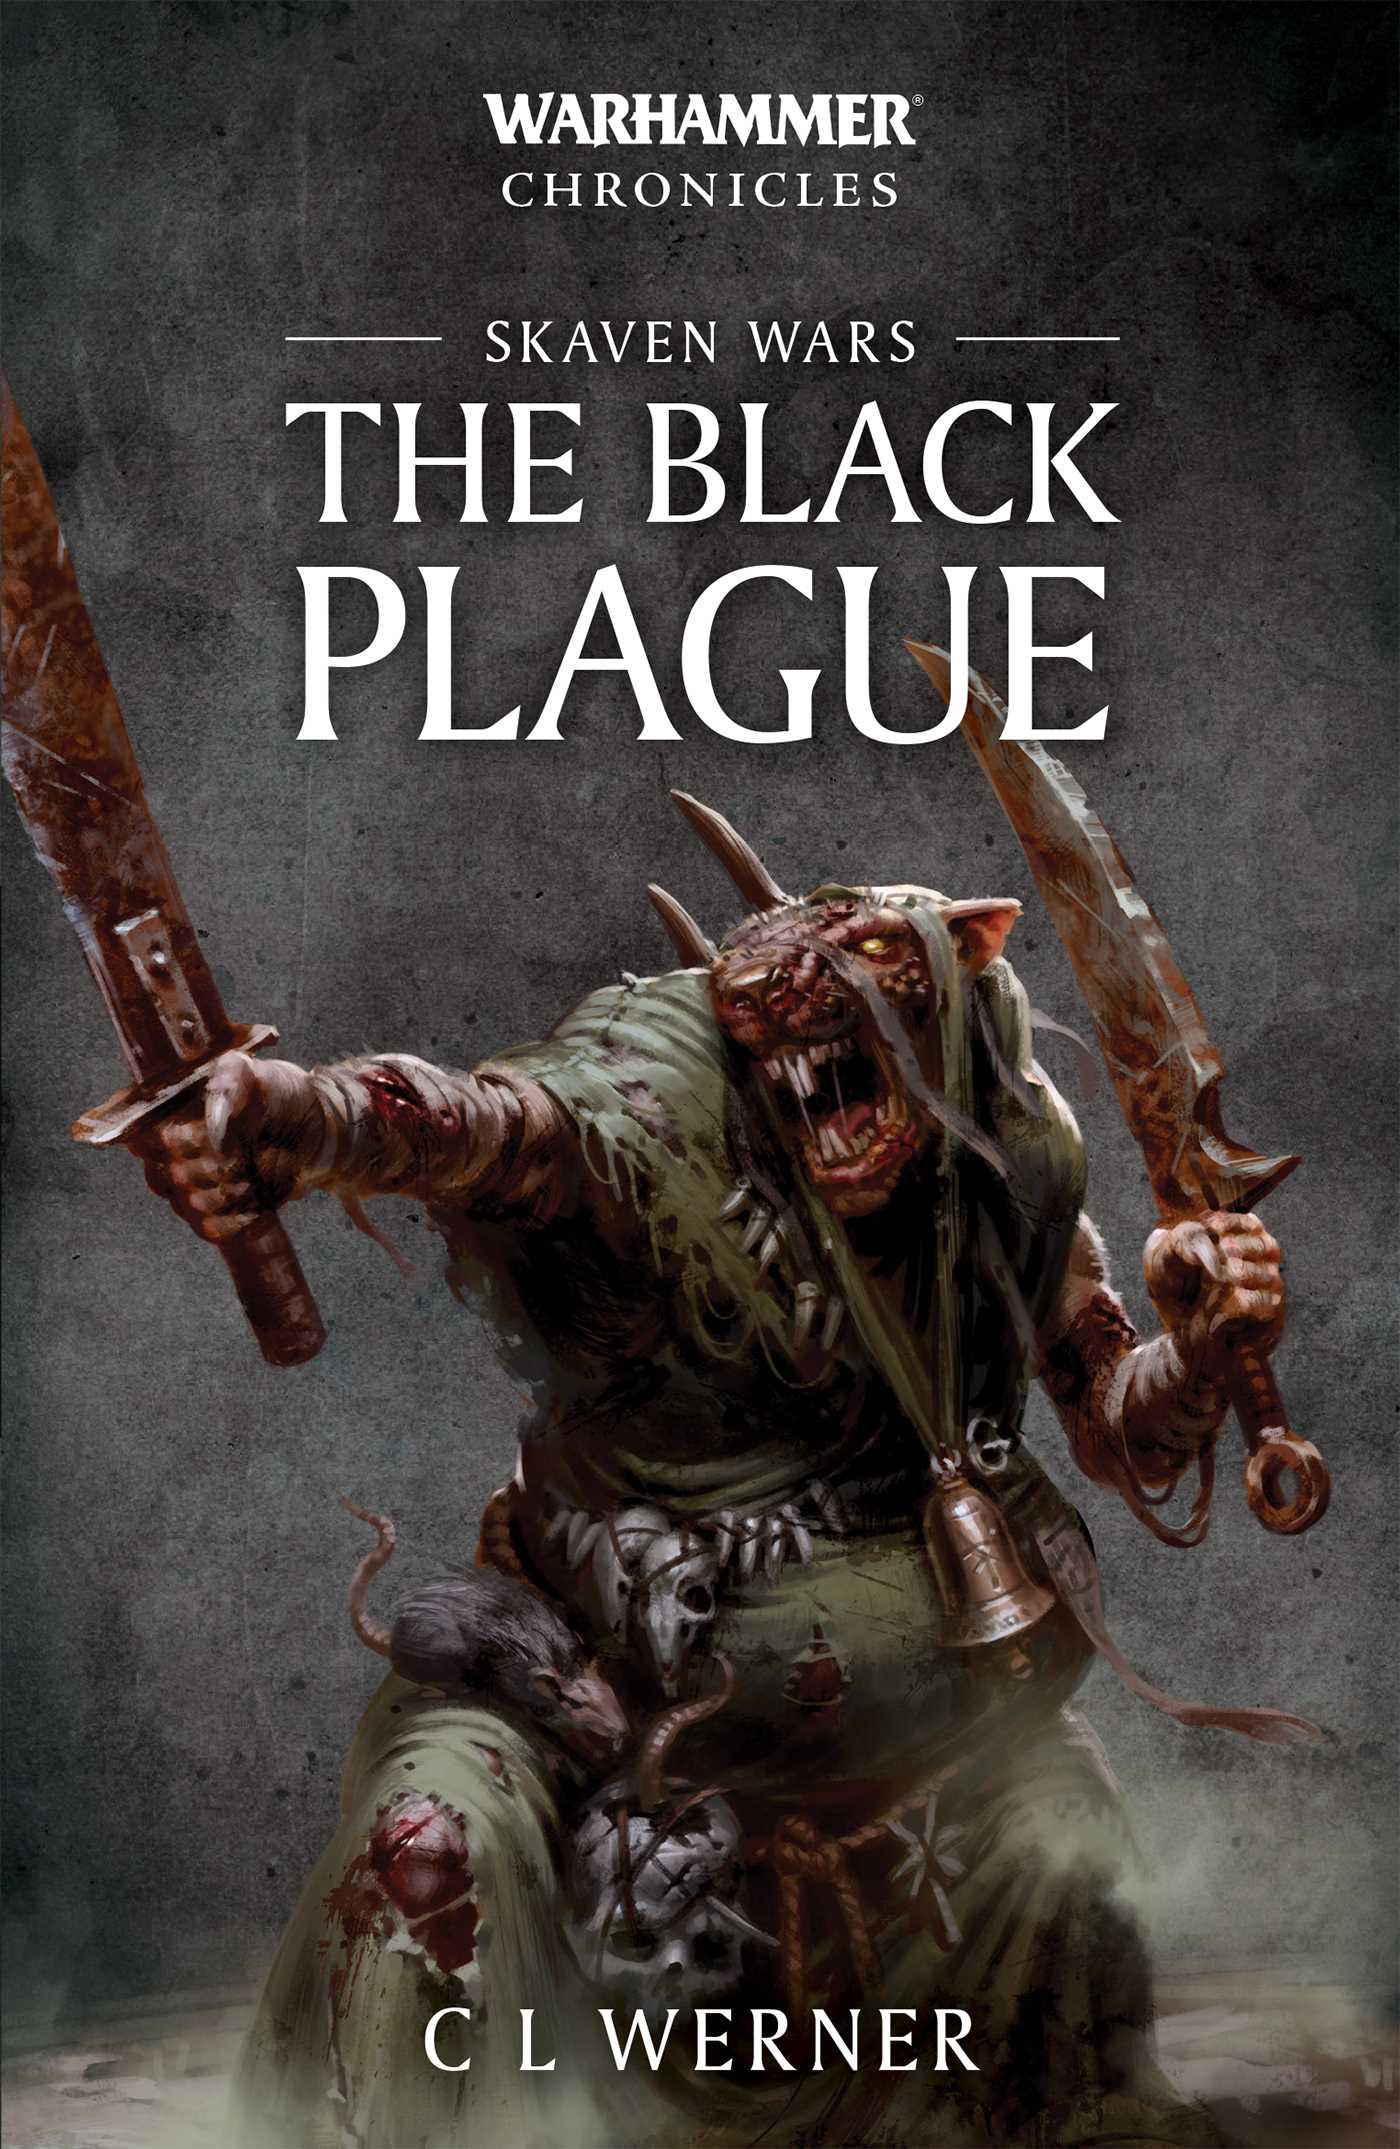 Skaven wars the black plague trilogy 9781784968069 hr